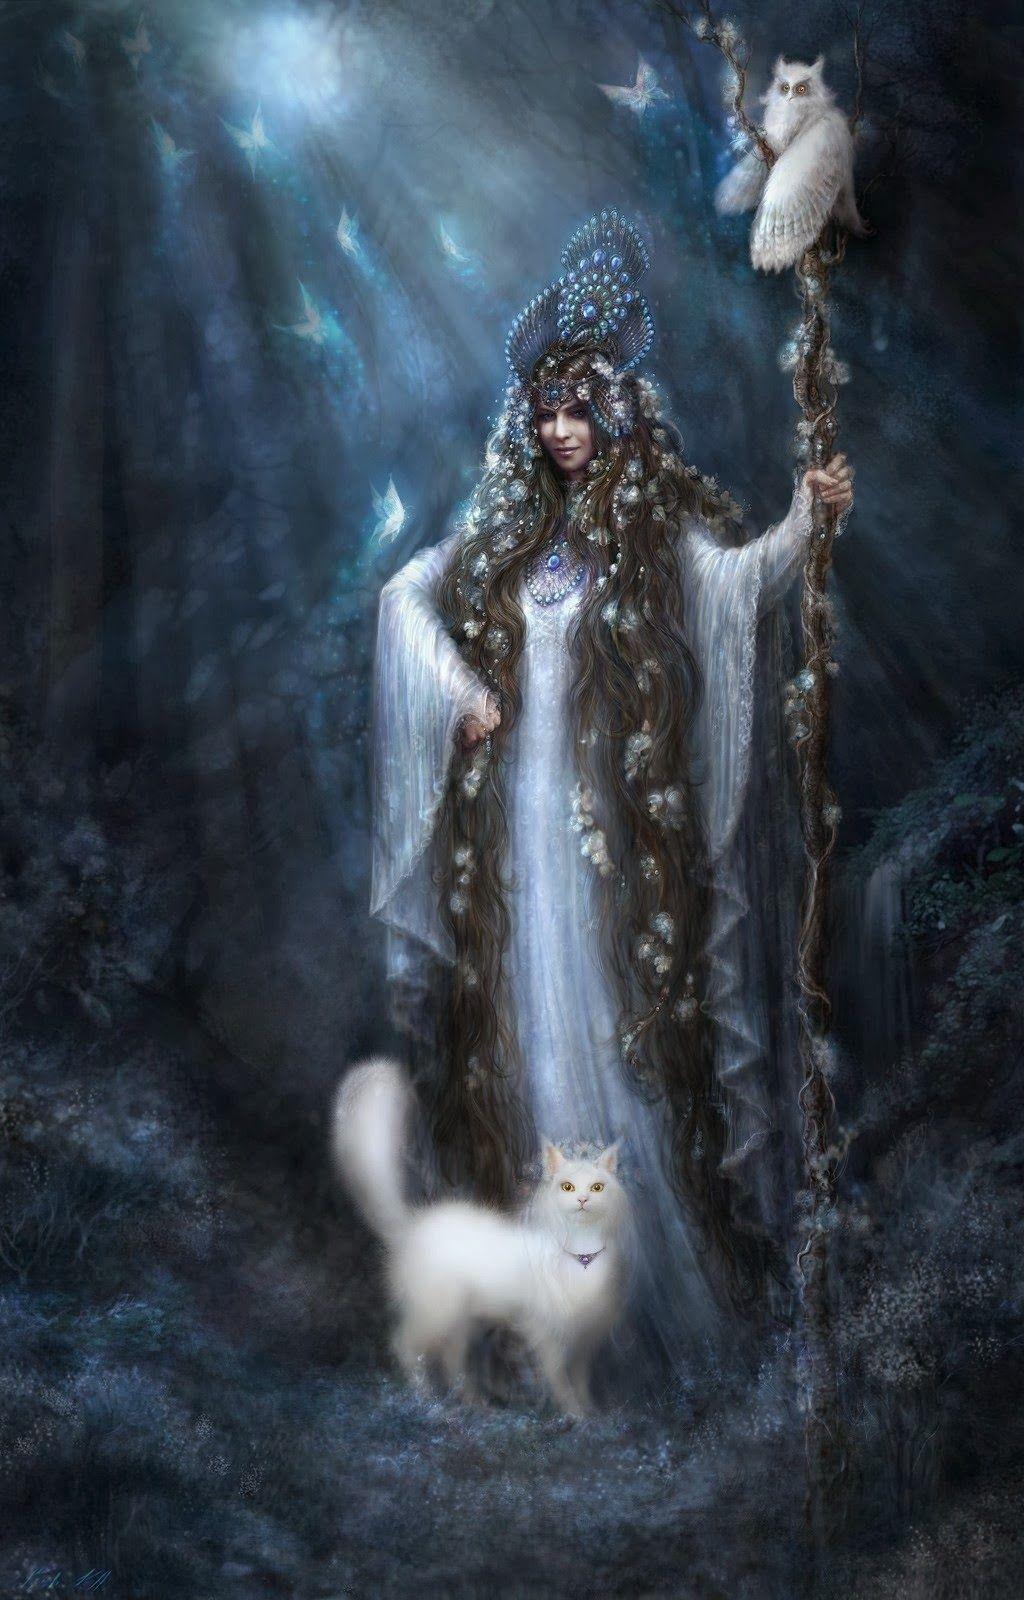 alain+klementieva+fantasy+and+modern+painter+20th+century+5+stars+phistars+witch+with+white+cat.jpg (1024×1600)